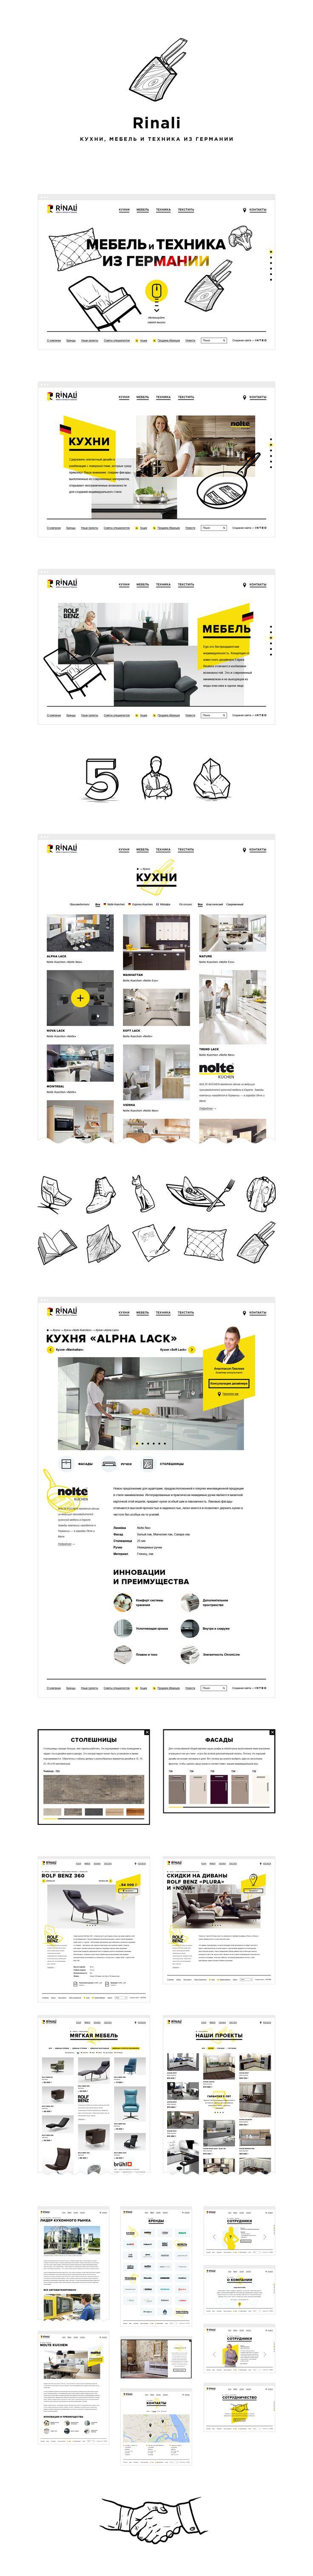 Rinali (2014), Сайт © Никита Тюрин